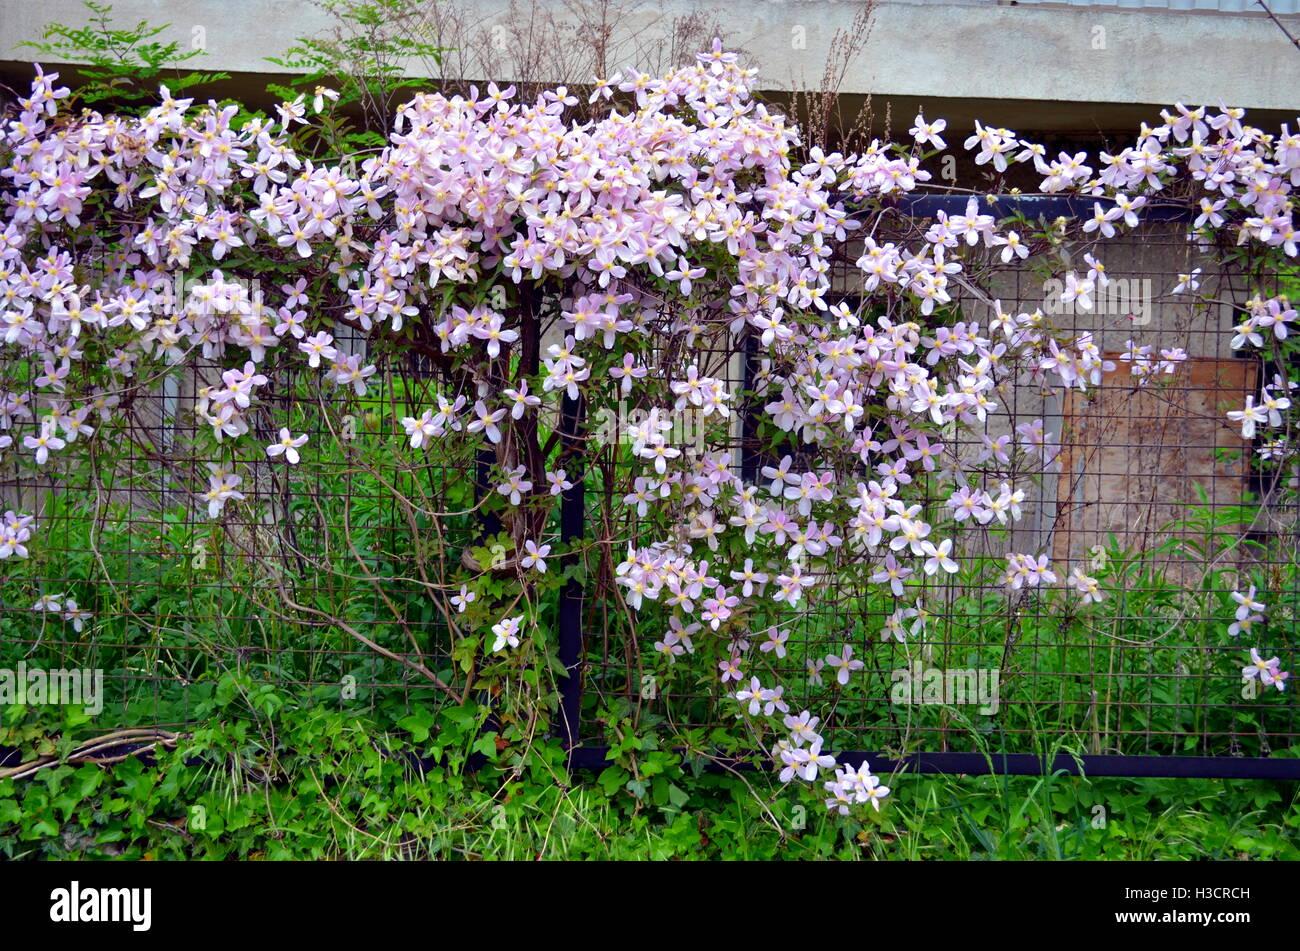 Pink clematis flowers climbing on garden gate stock photo 122598353 pink clematis flowers climbing on garden gate mightylinksfo